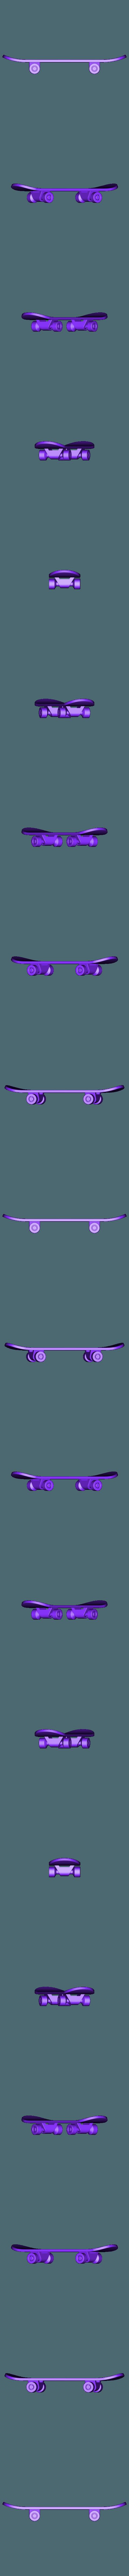 skateboardz.stl Download free STL file Skateboardz • 3D printer design, Muzz64